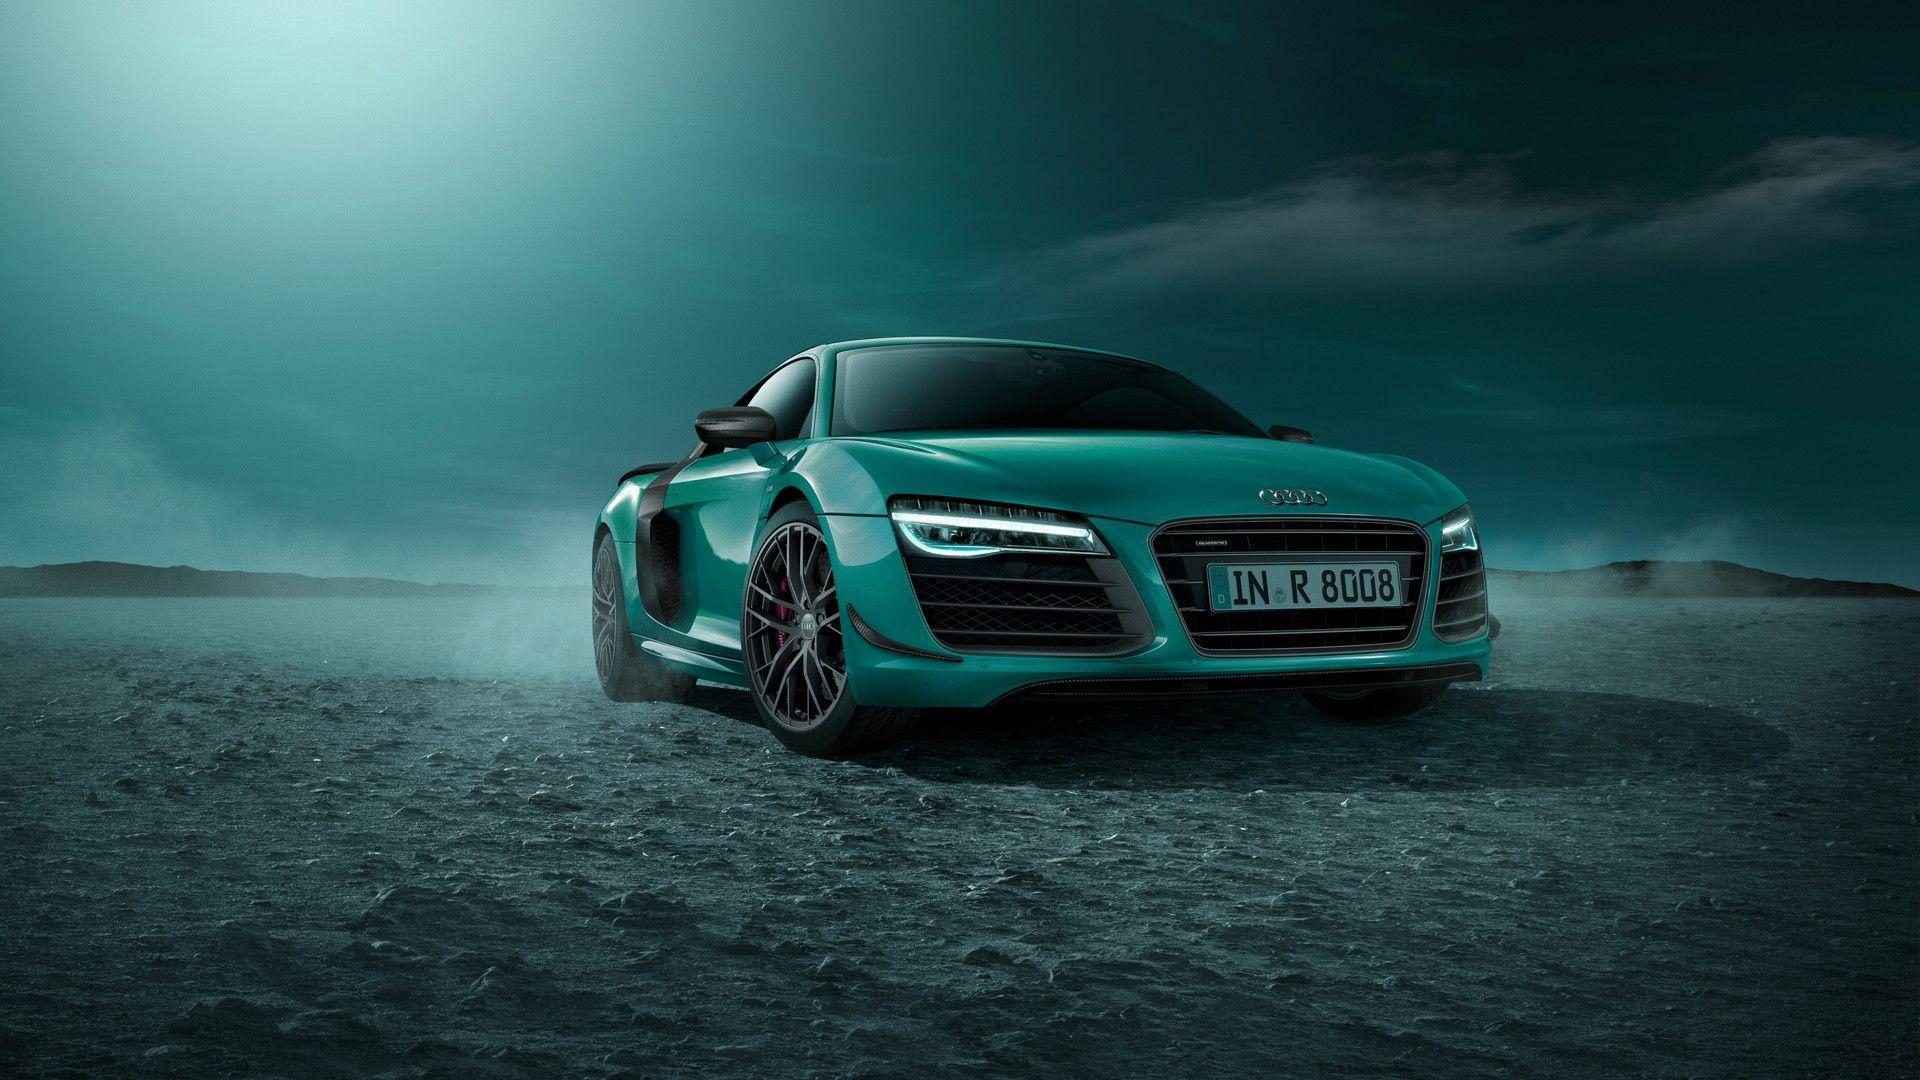 58 Best Free 8k Ultra Hd Audi Wallpapers Wallpaperaccess